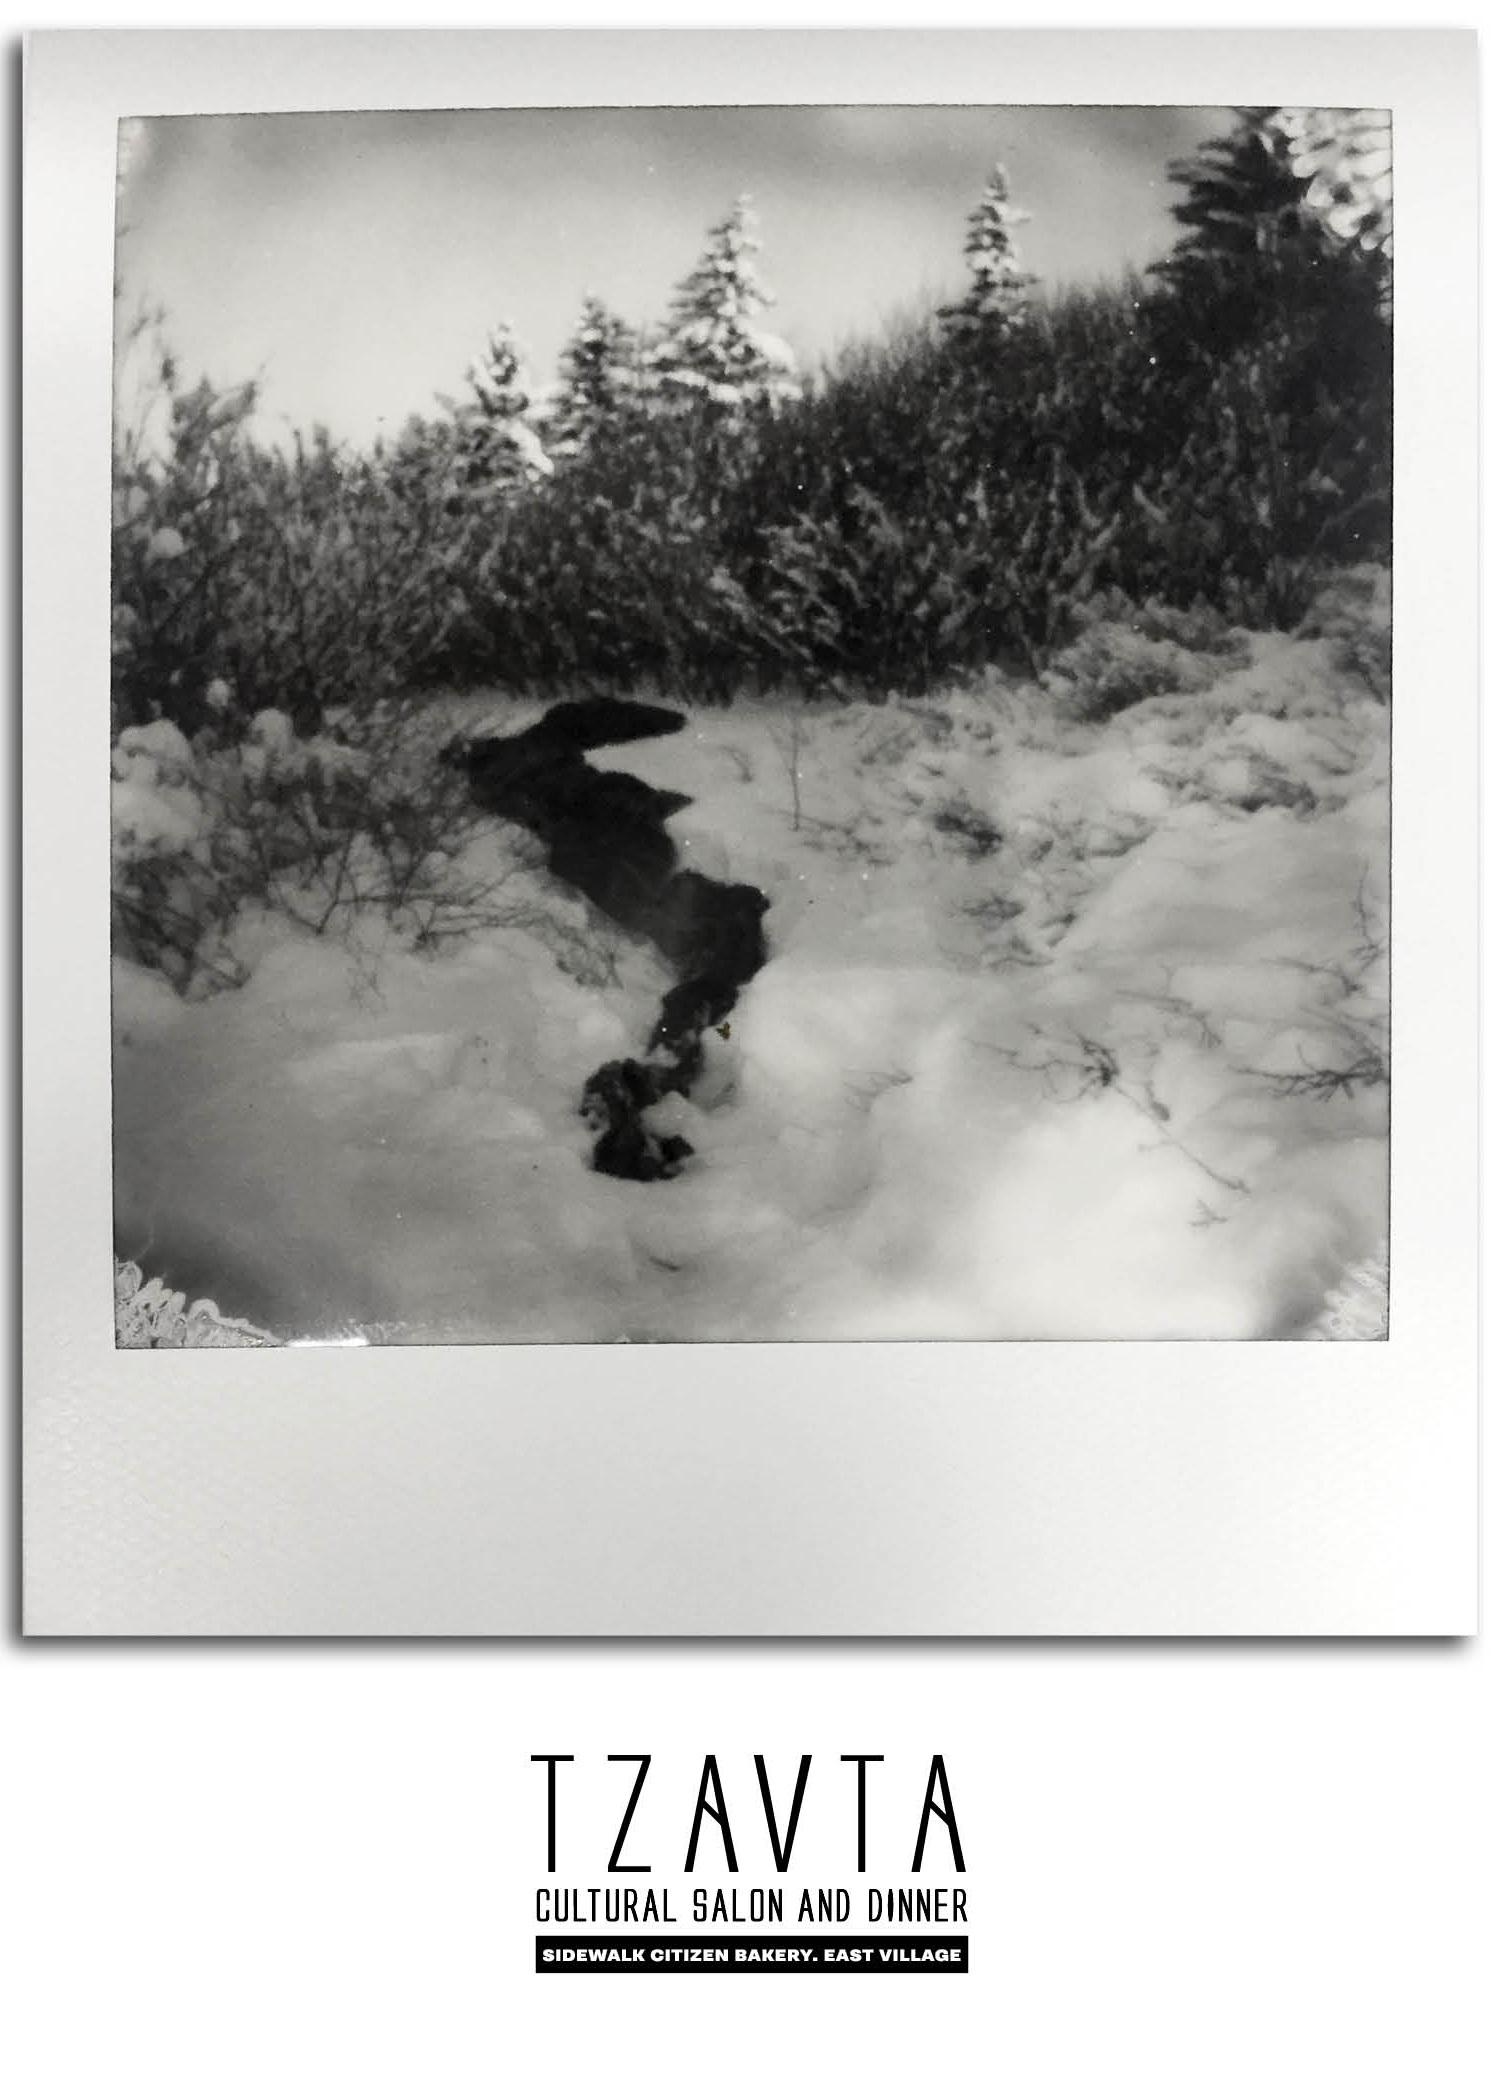 TZAVTA #21